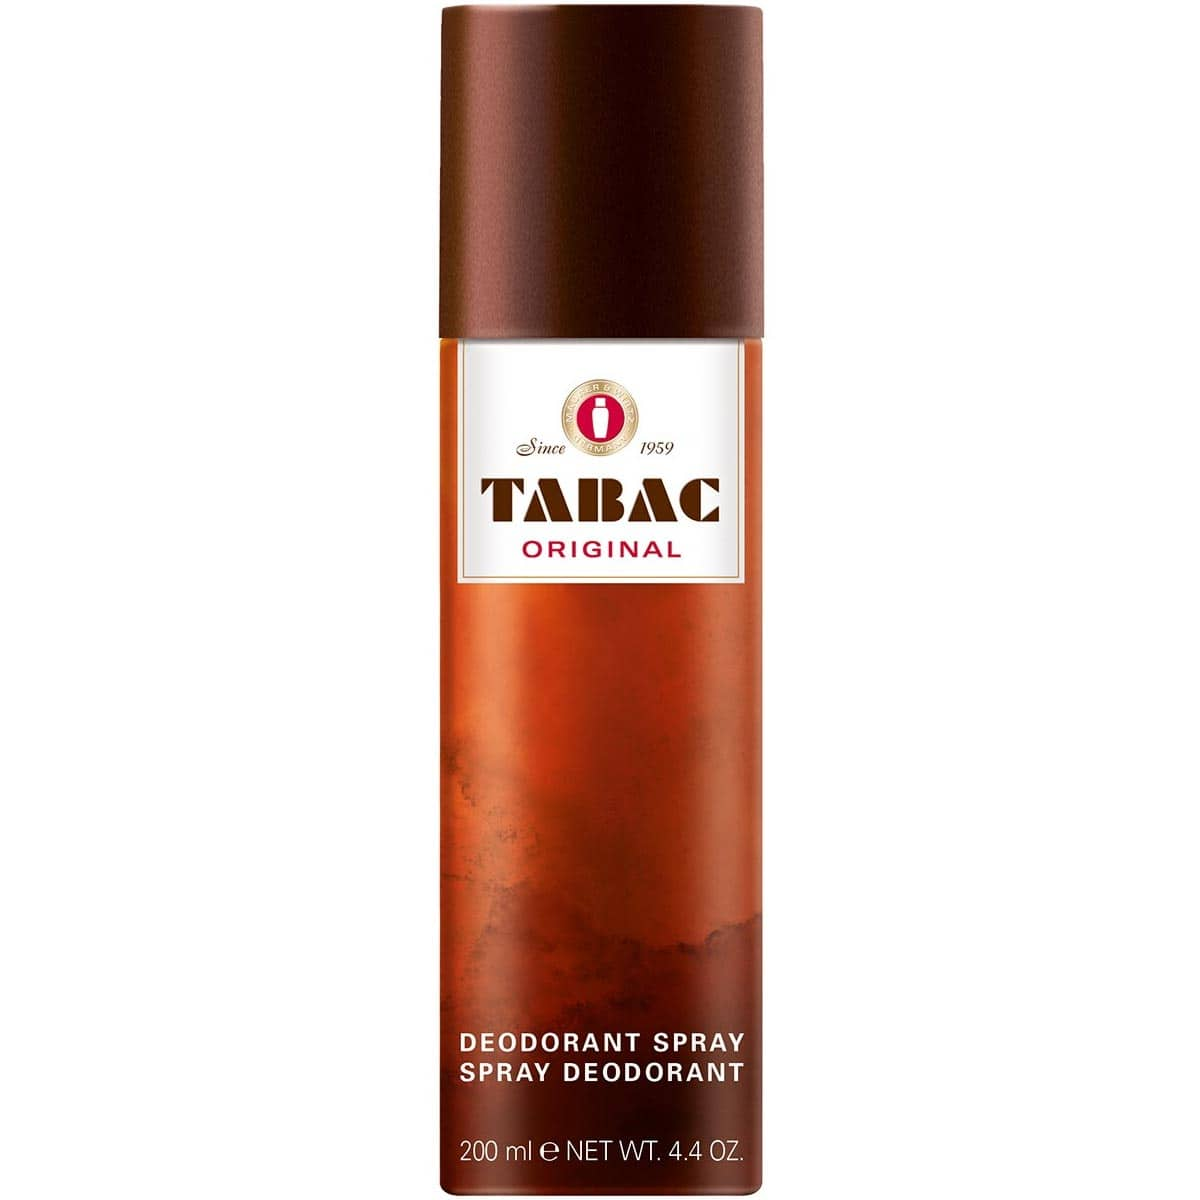 Tabac - Tabac Original - Déodorant Spray